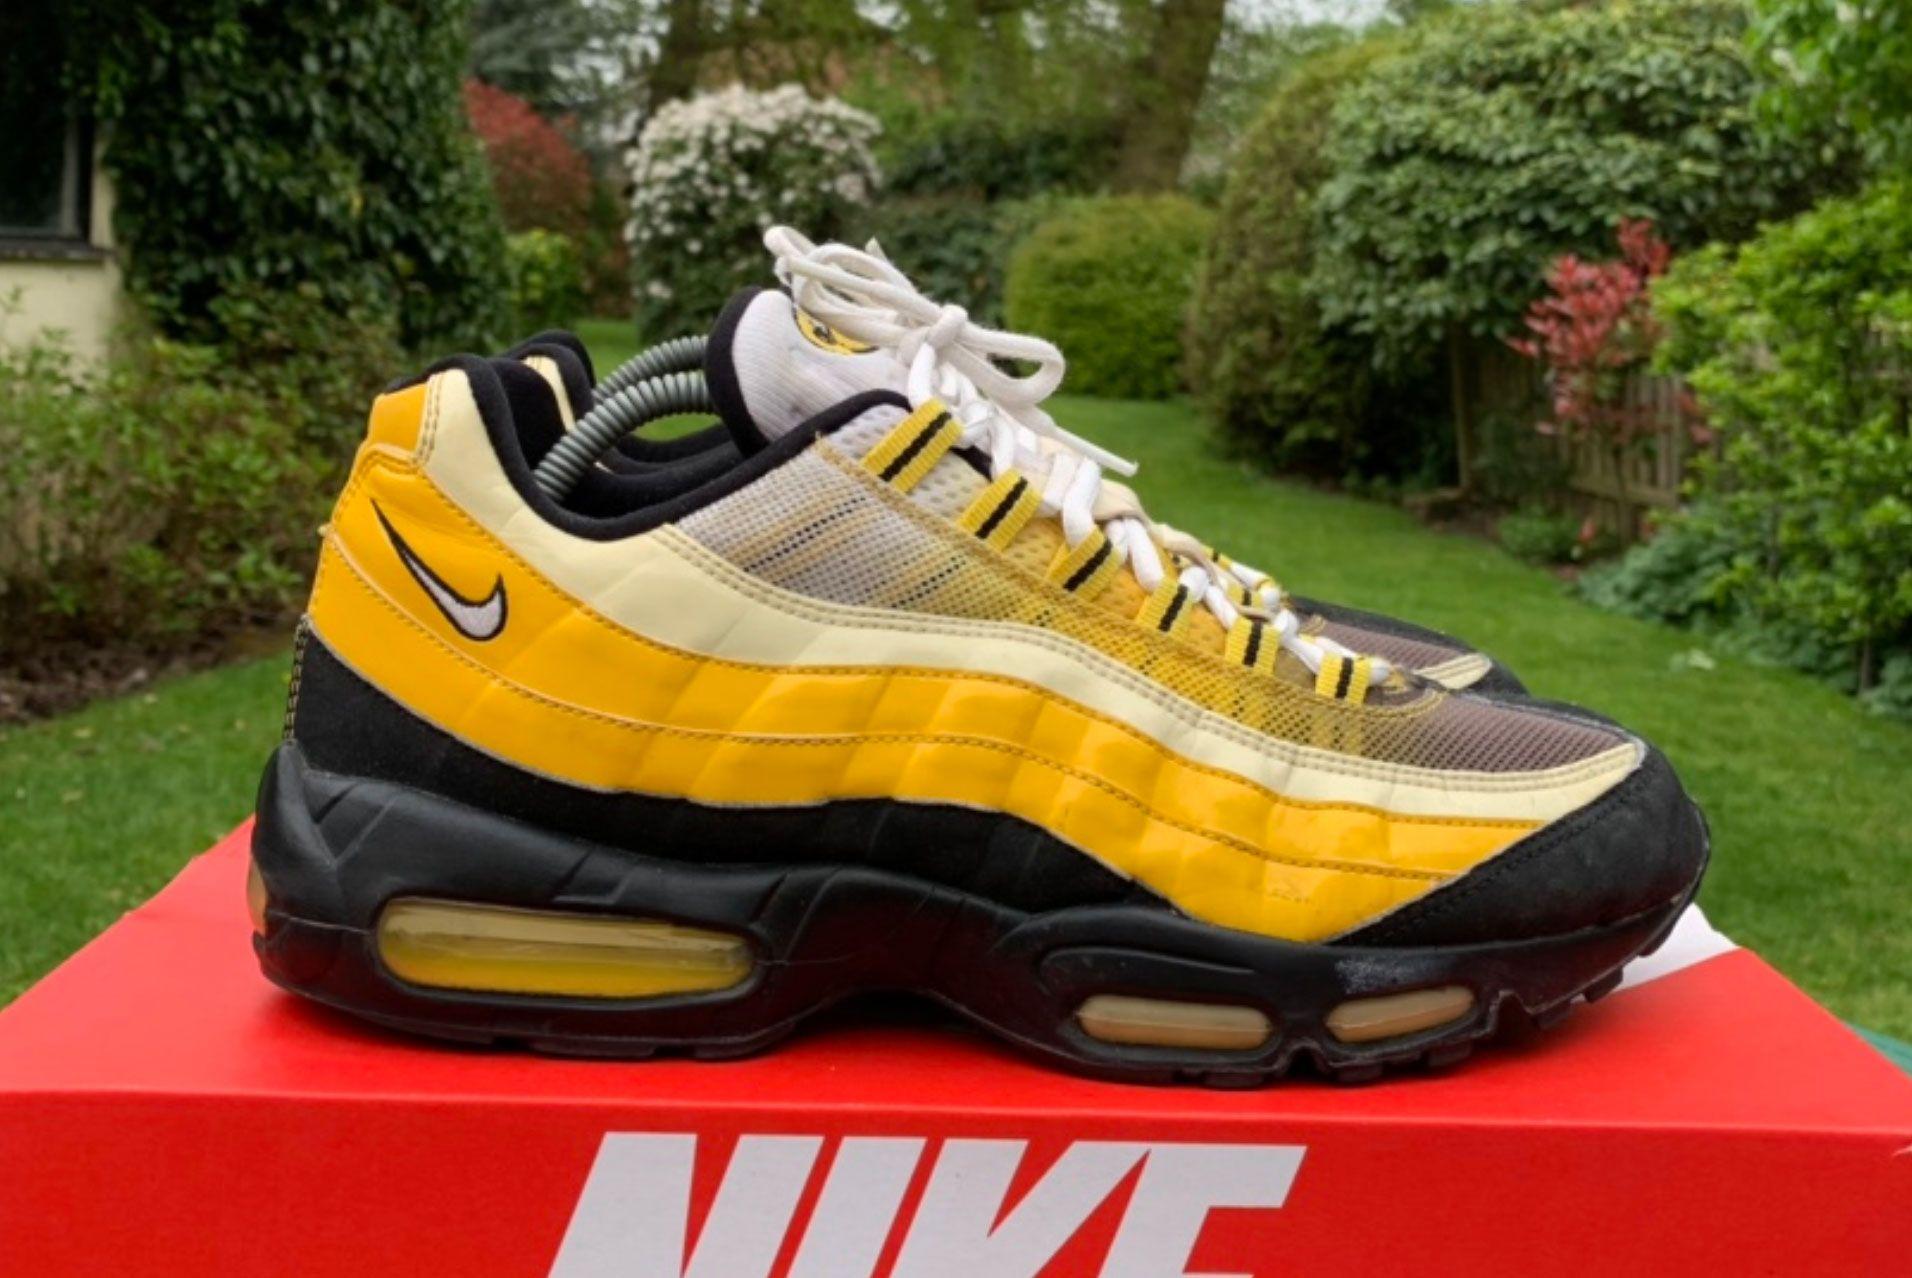 Nike Air Max 95 'Bumblebee' (2006)